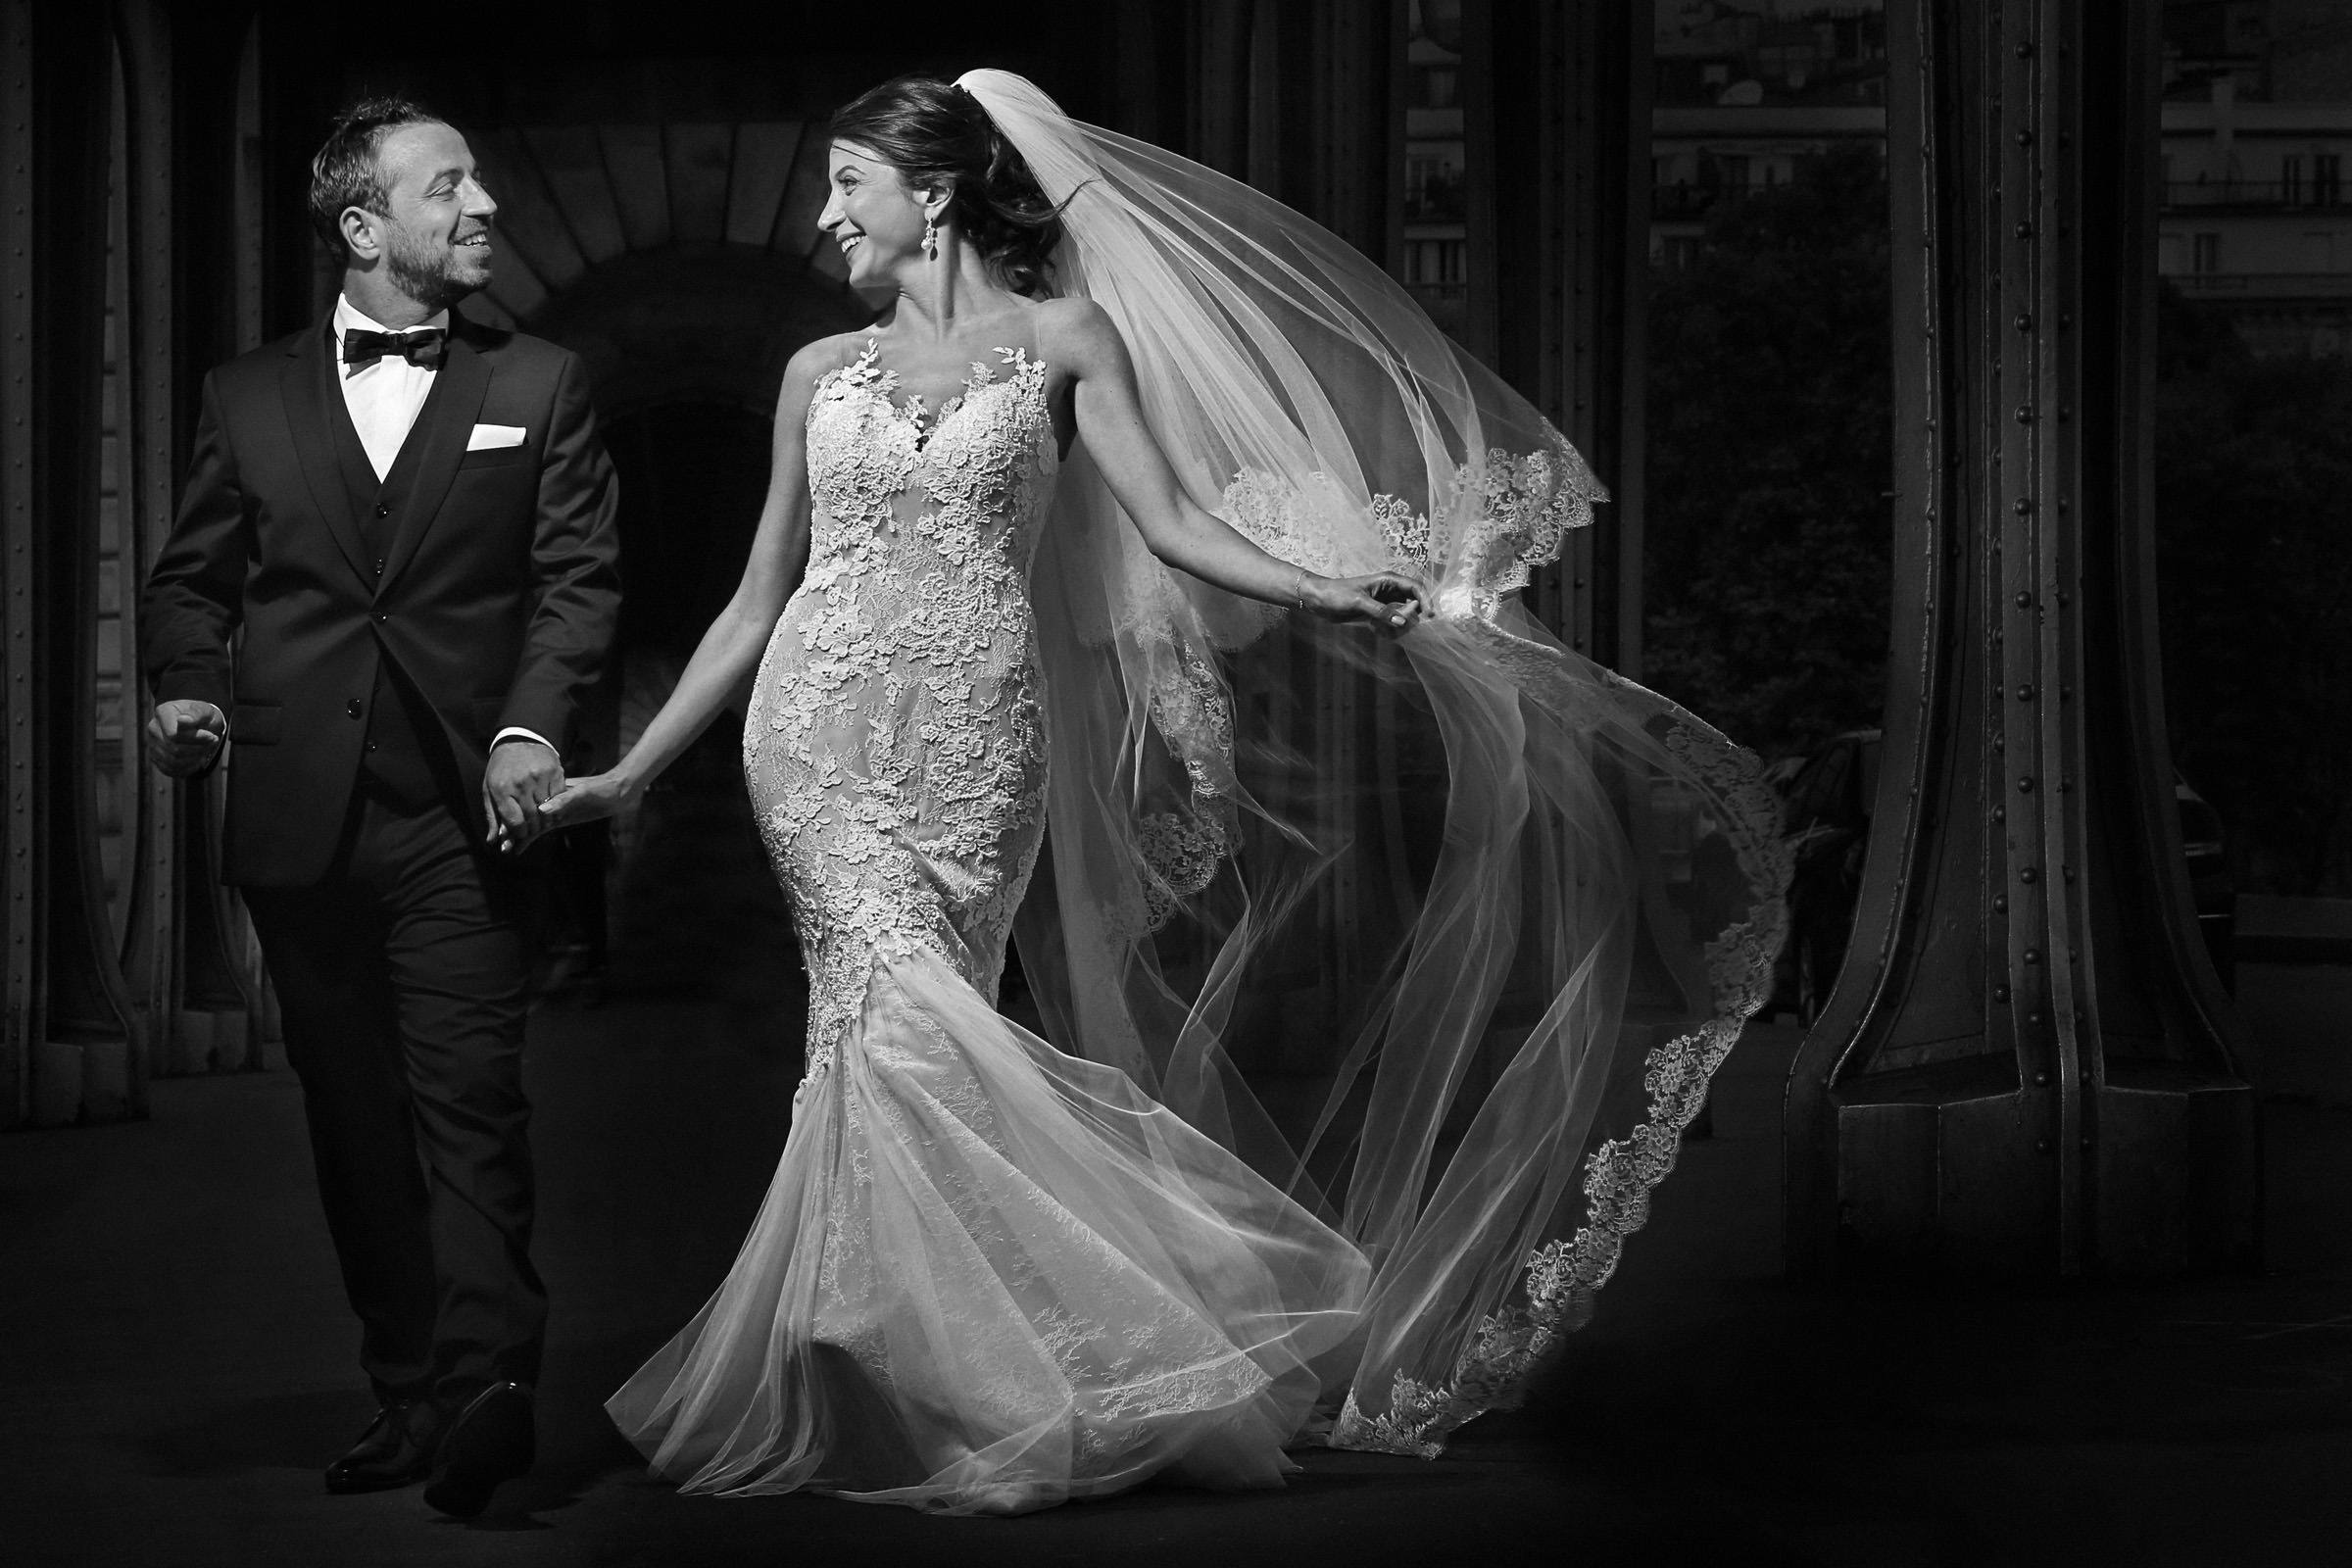 Bride and groom joyfully walking towards camera, by Franck Boutonnet